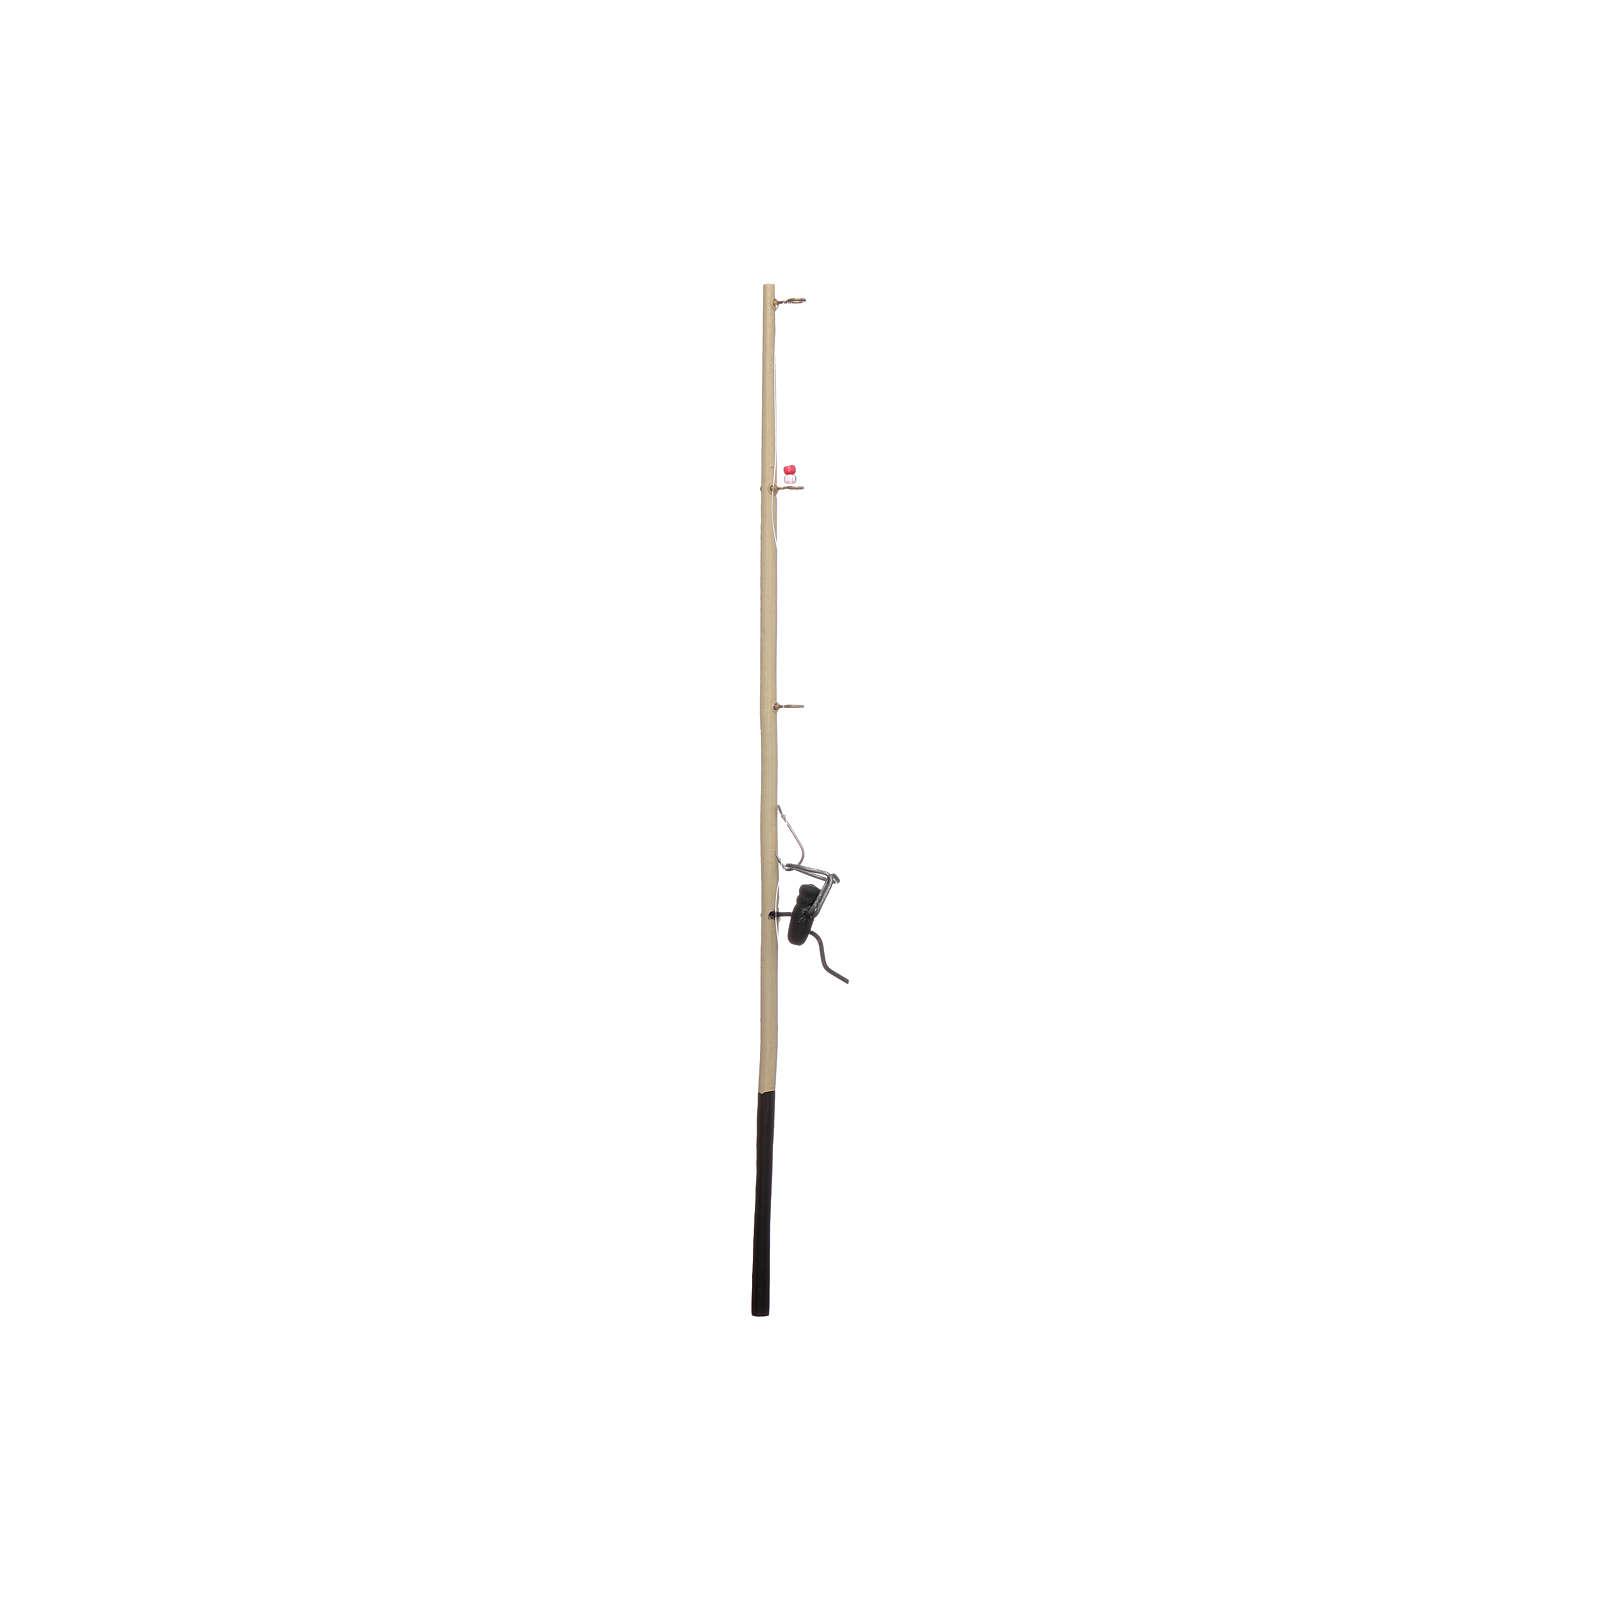 Canna da pesca presepe legno h reale 17,5 cm 4